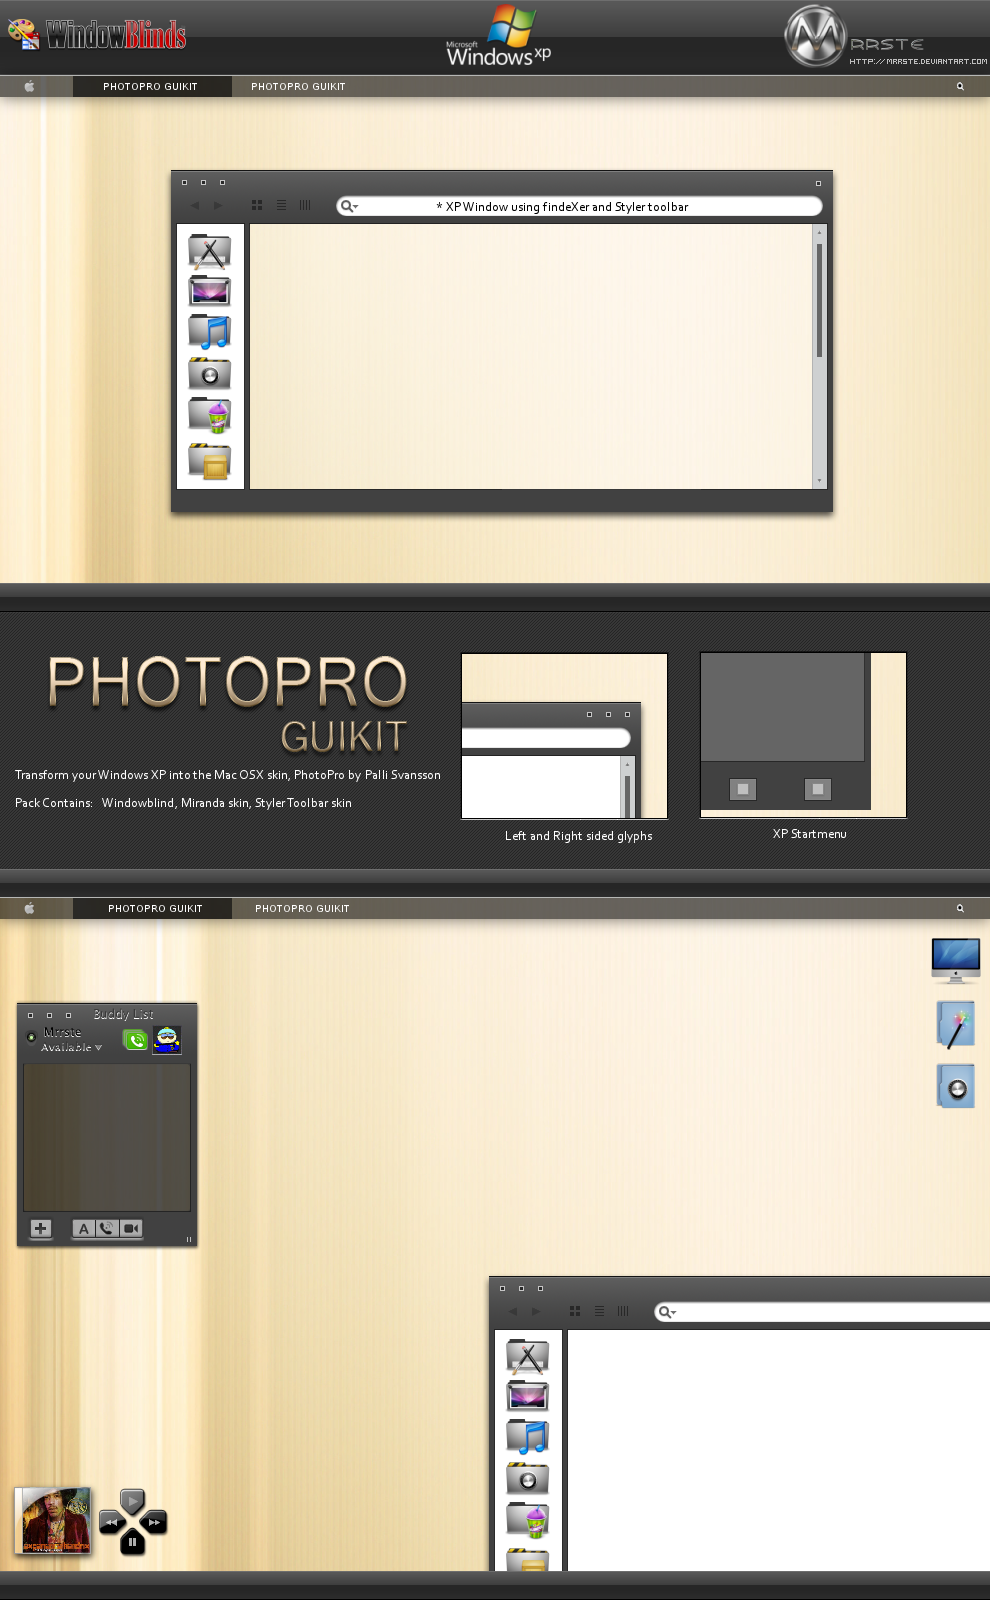 PhotoPro 1.5 GUI by mrrste